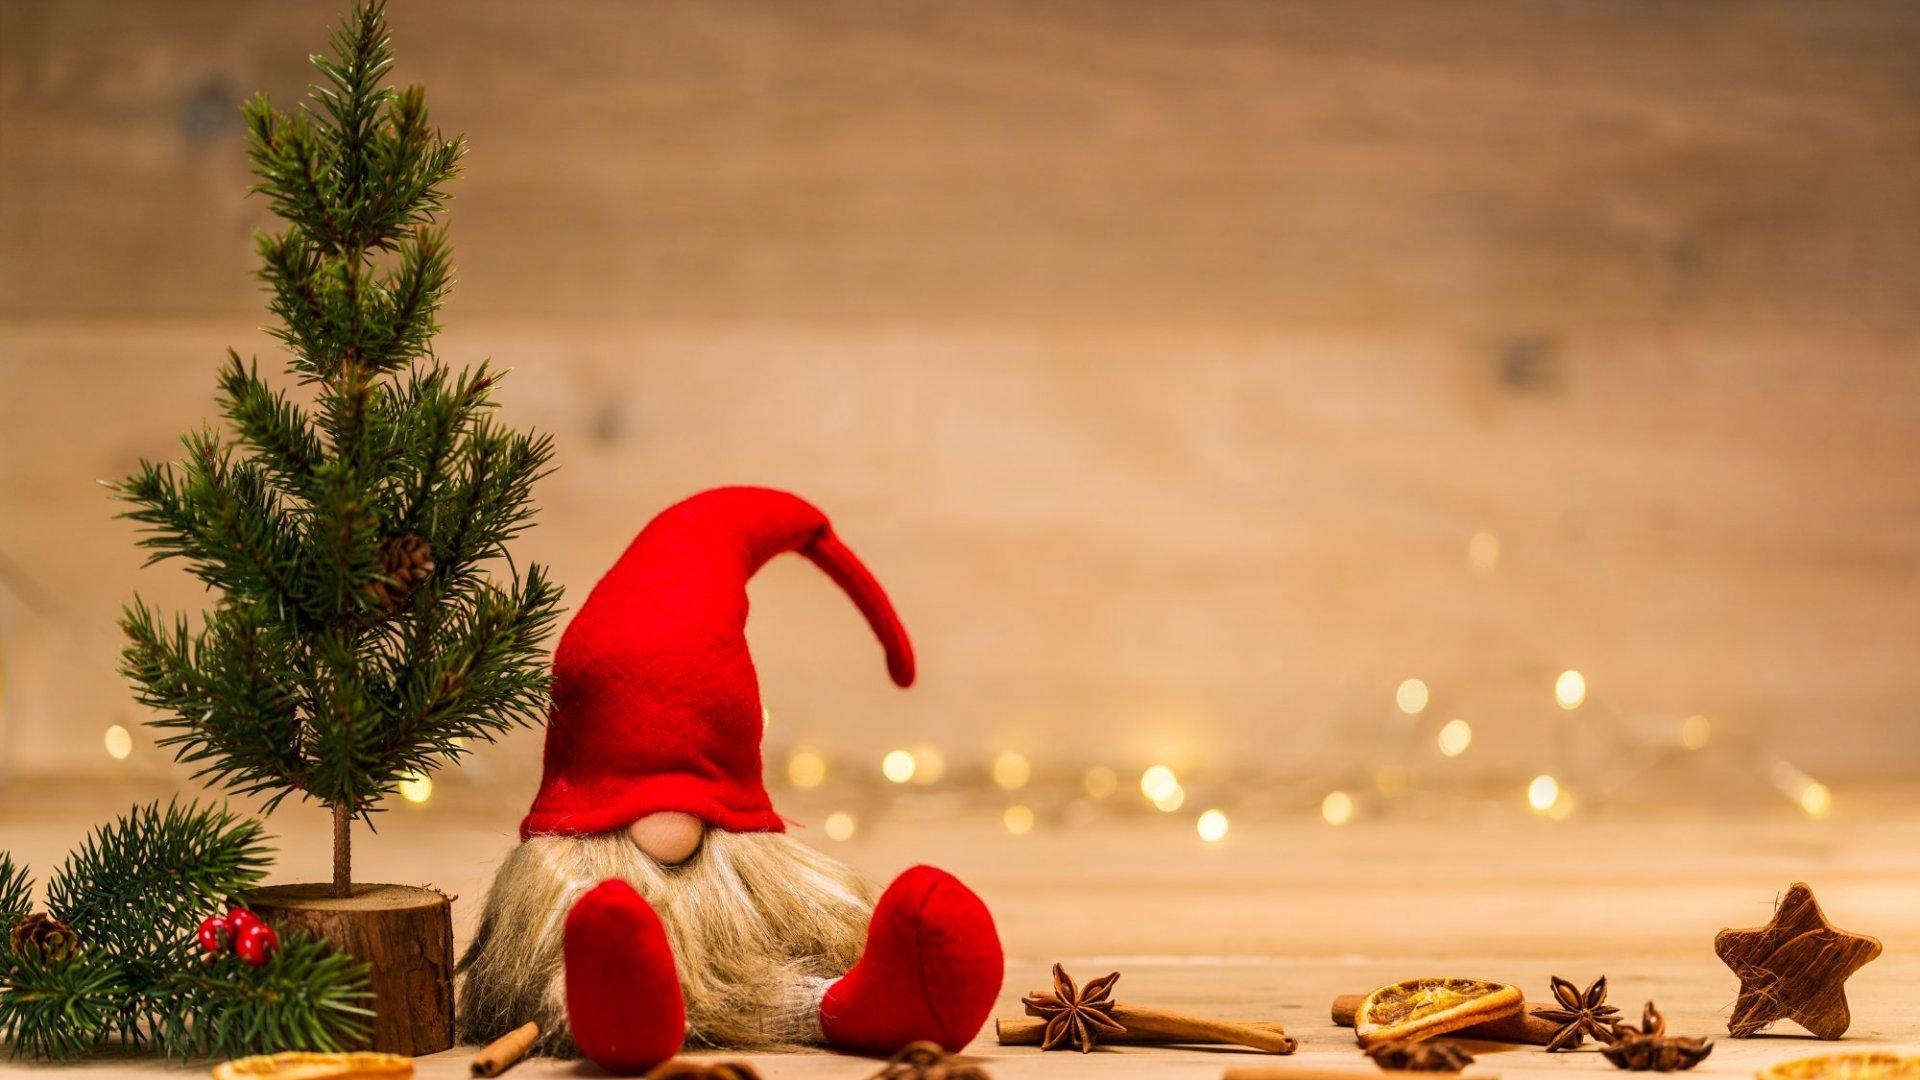 8 Secrets to Getting Organized This Holiday Season